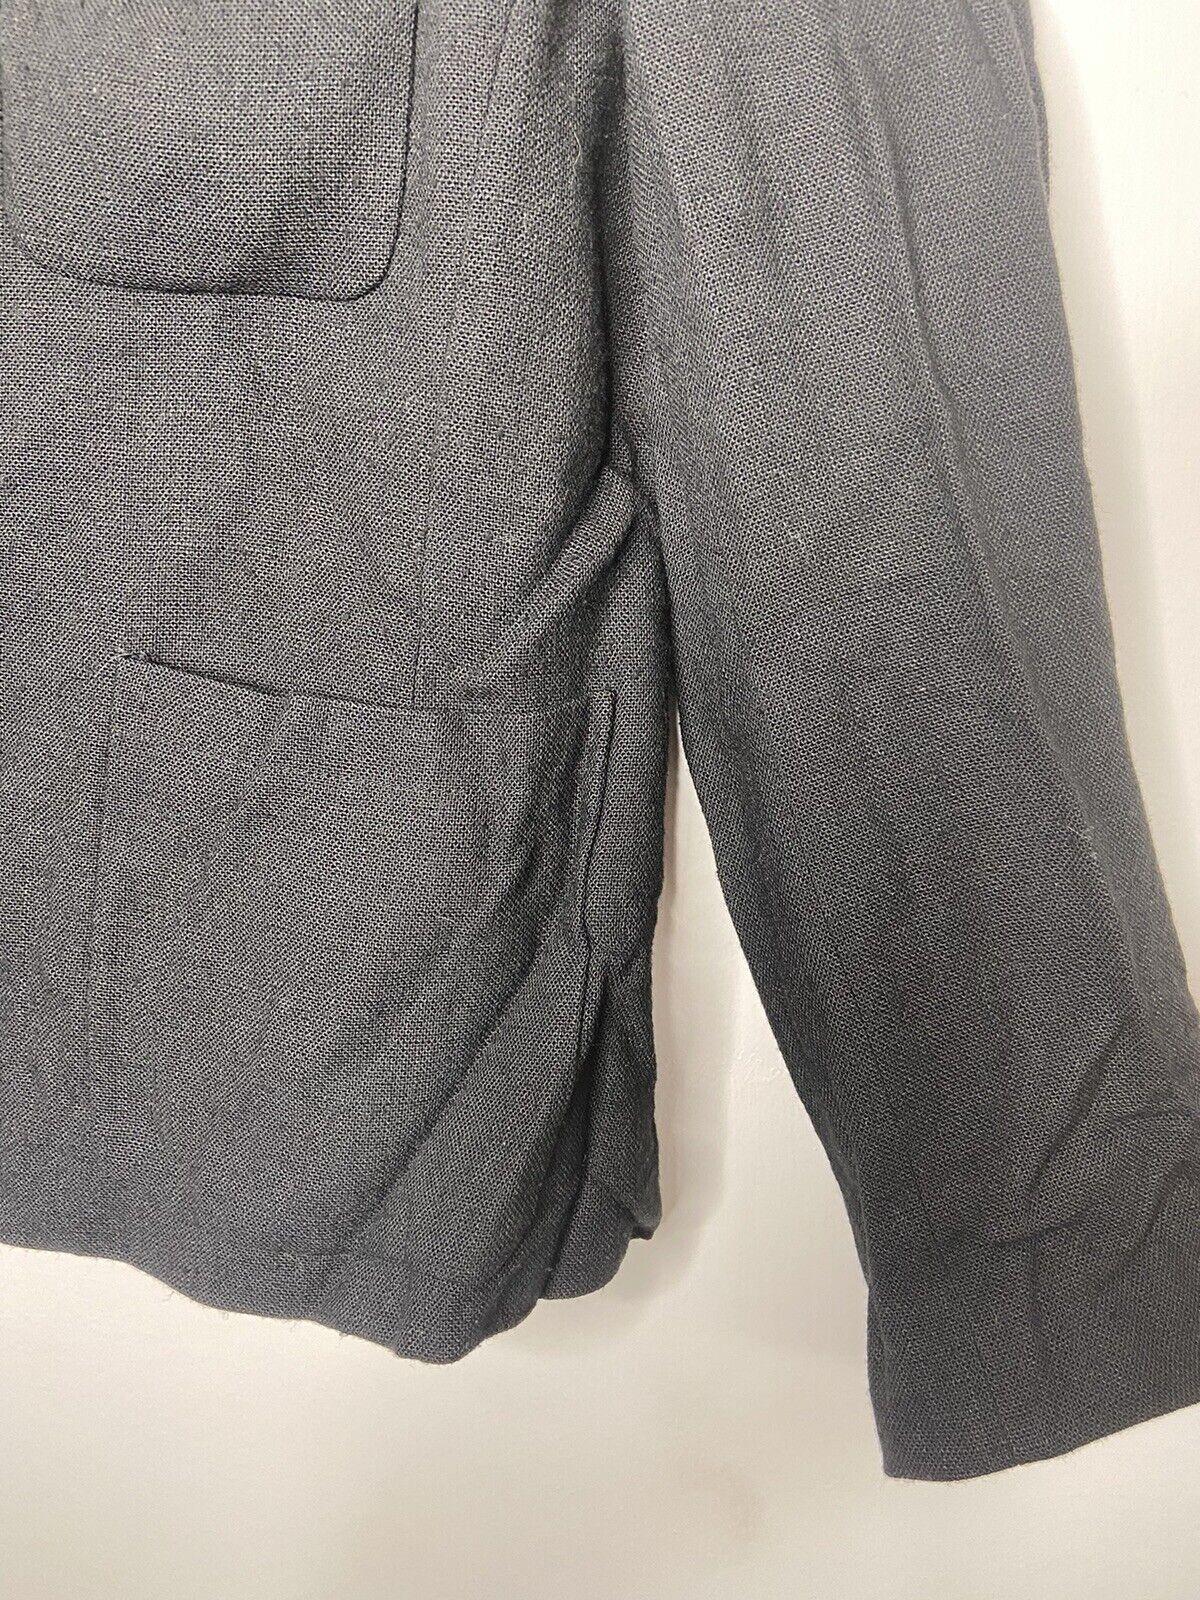 Vintage 90s Prada Womens Black Blazer Suit Jacket… - image 5